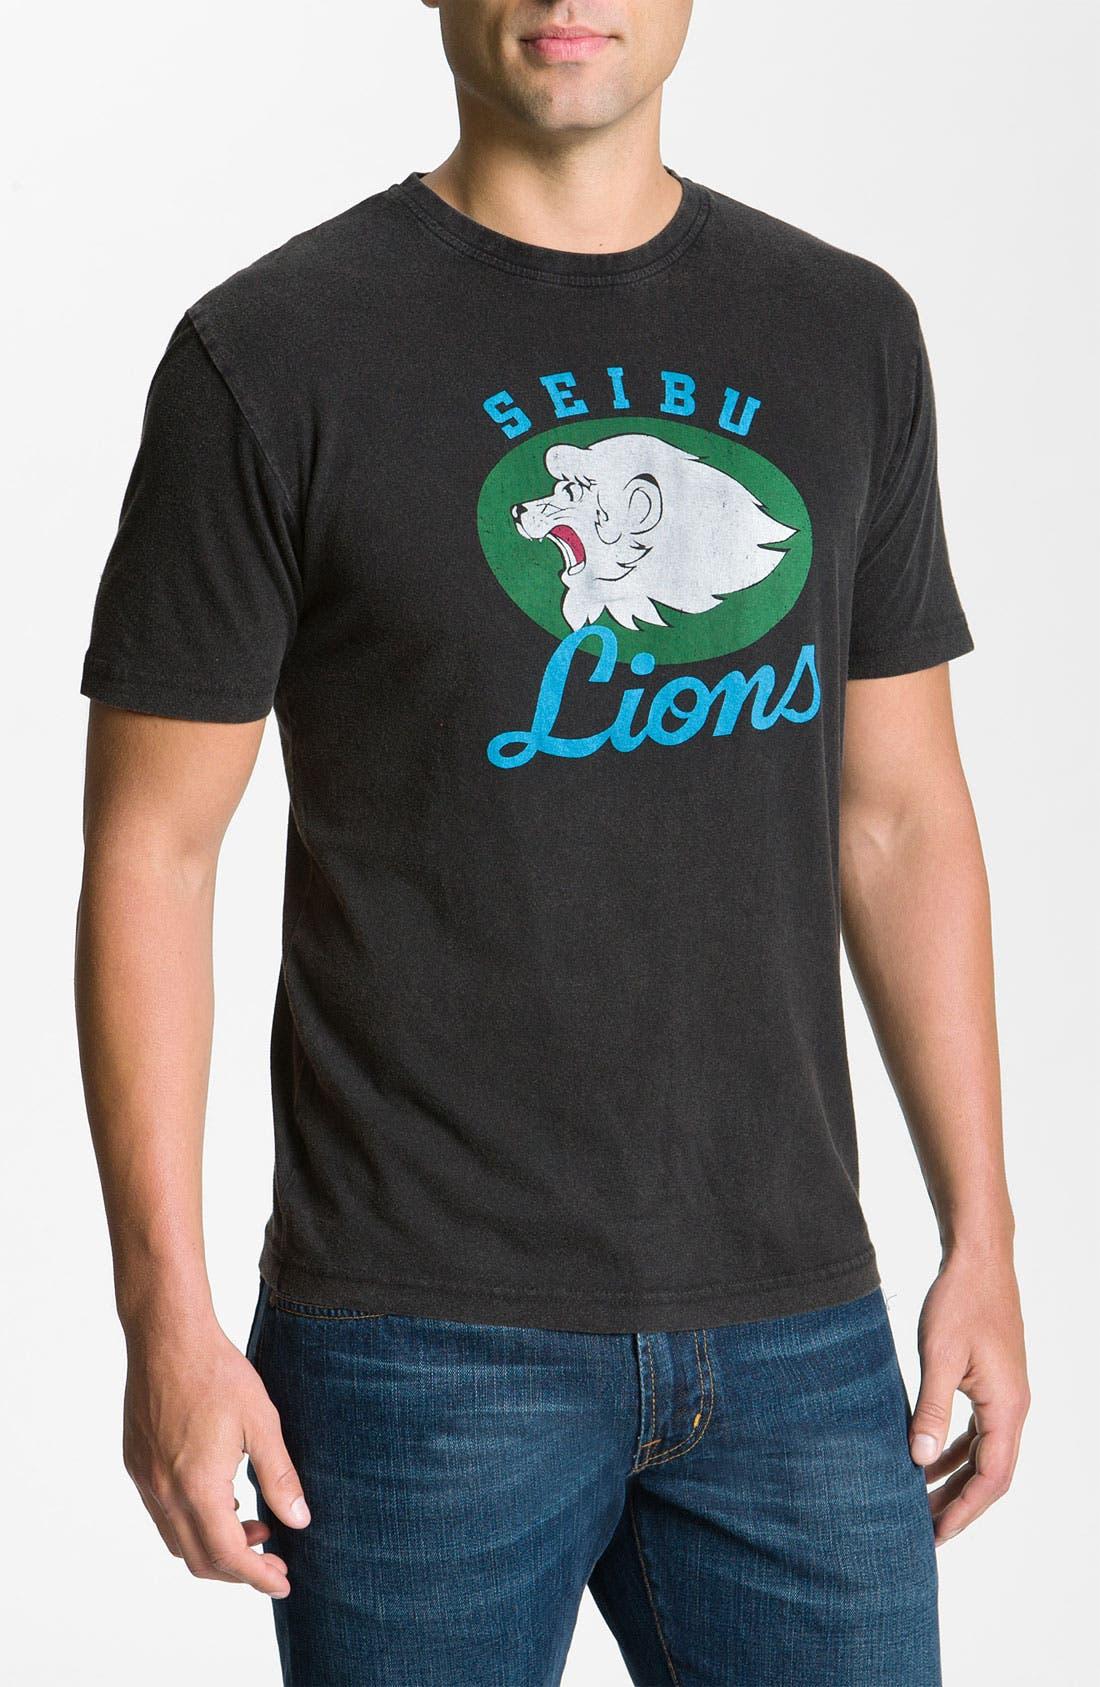 Alternate Image 1 Selected - Red Jacket 'Saitama Seibu Lions' Regular Fit Crewneck T-Shirt (Men)